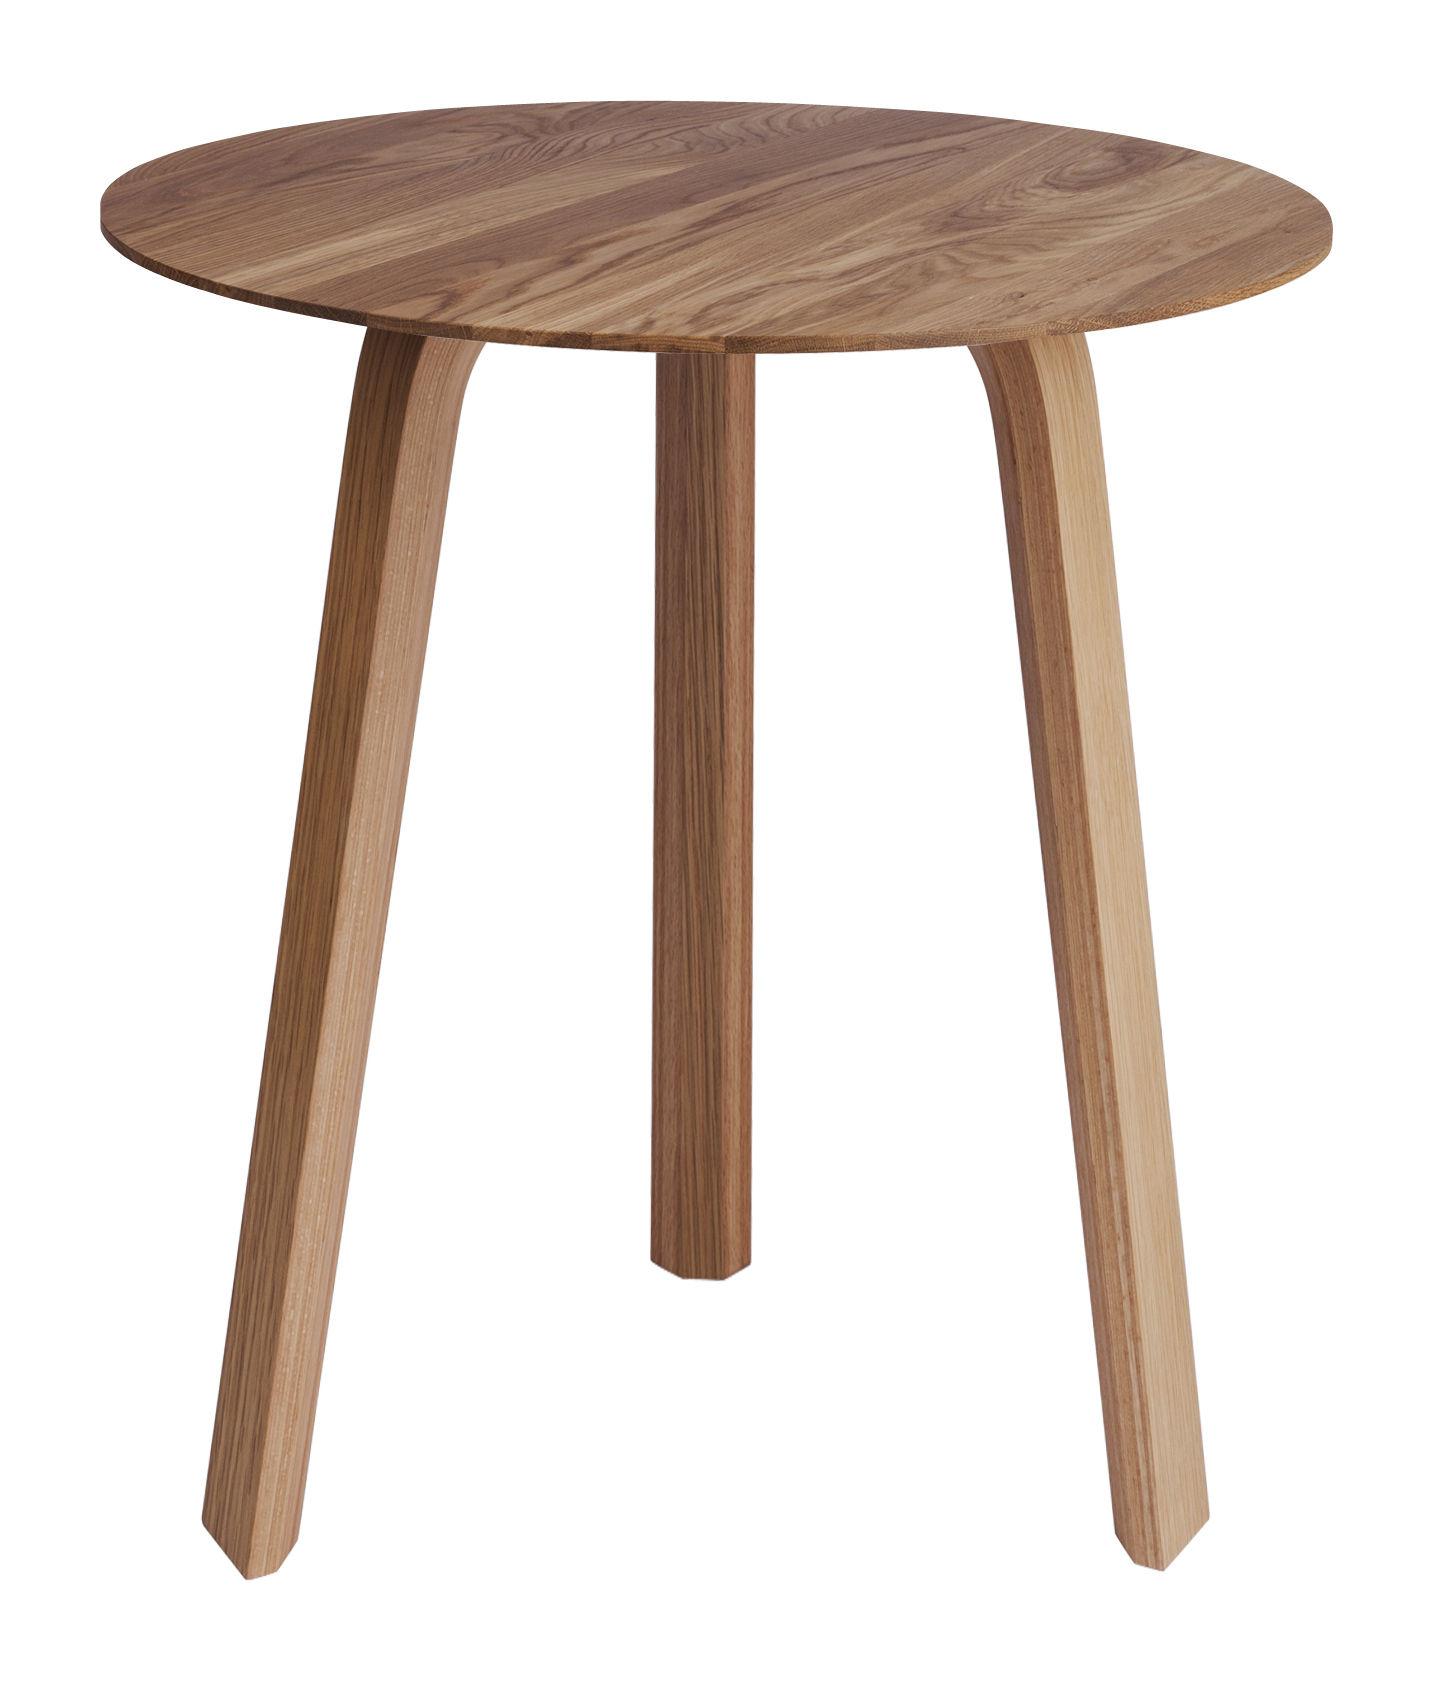 Mobilier - Tables basses - Table basse Bella / Ø 45 x H 49 cm - Hay - Chêne naturel - Chêne massif huilé